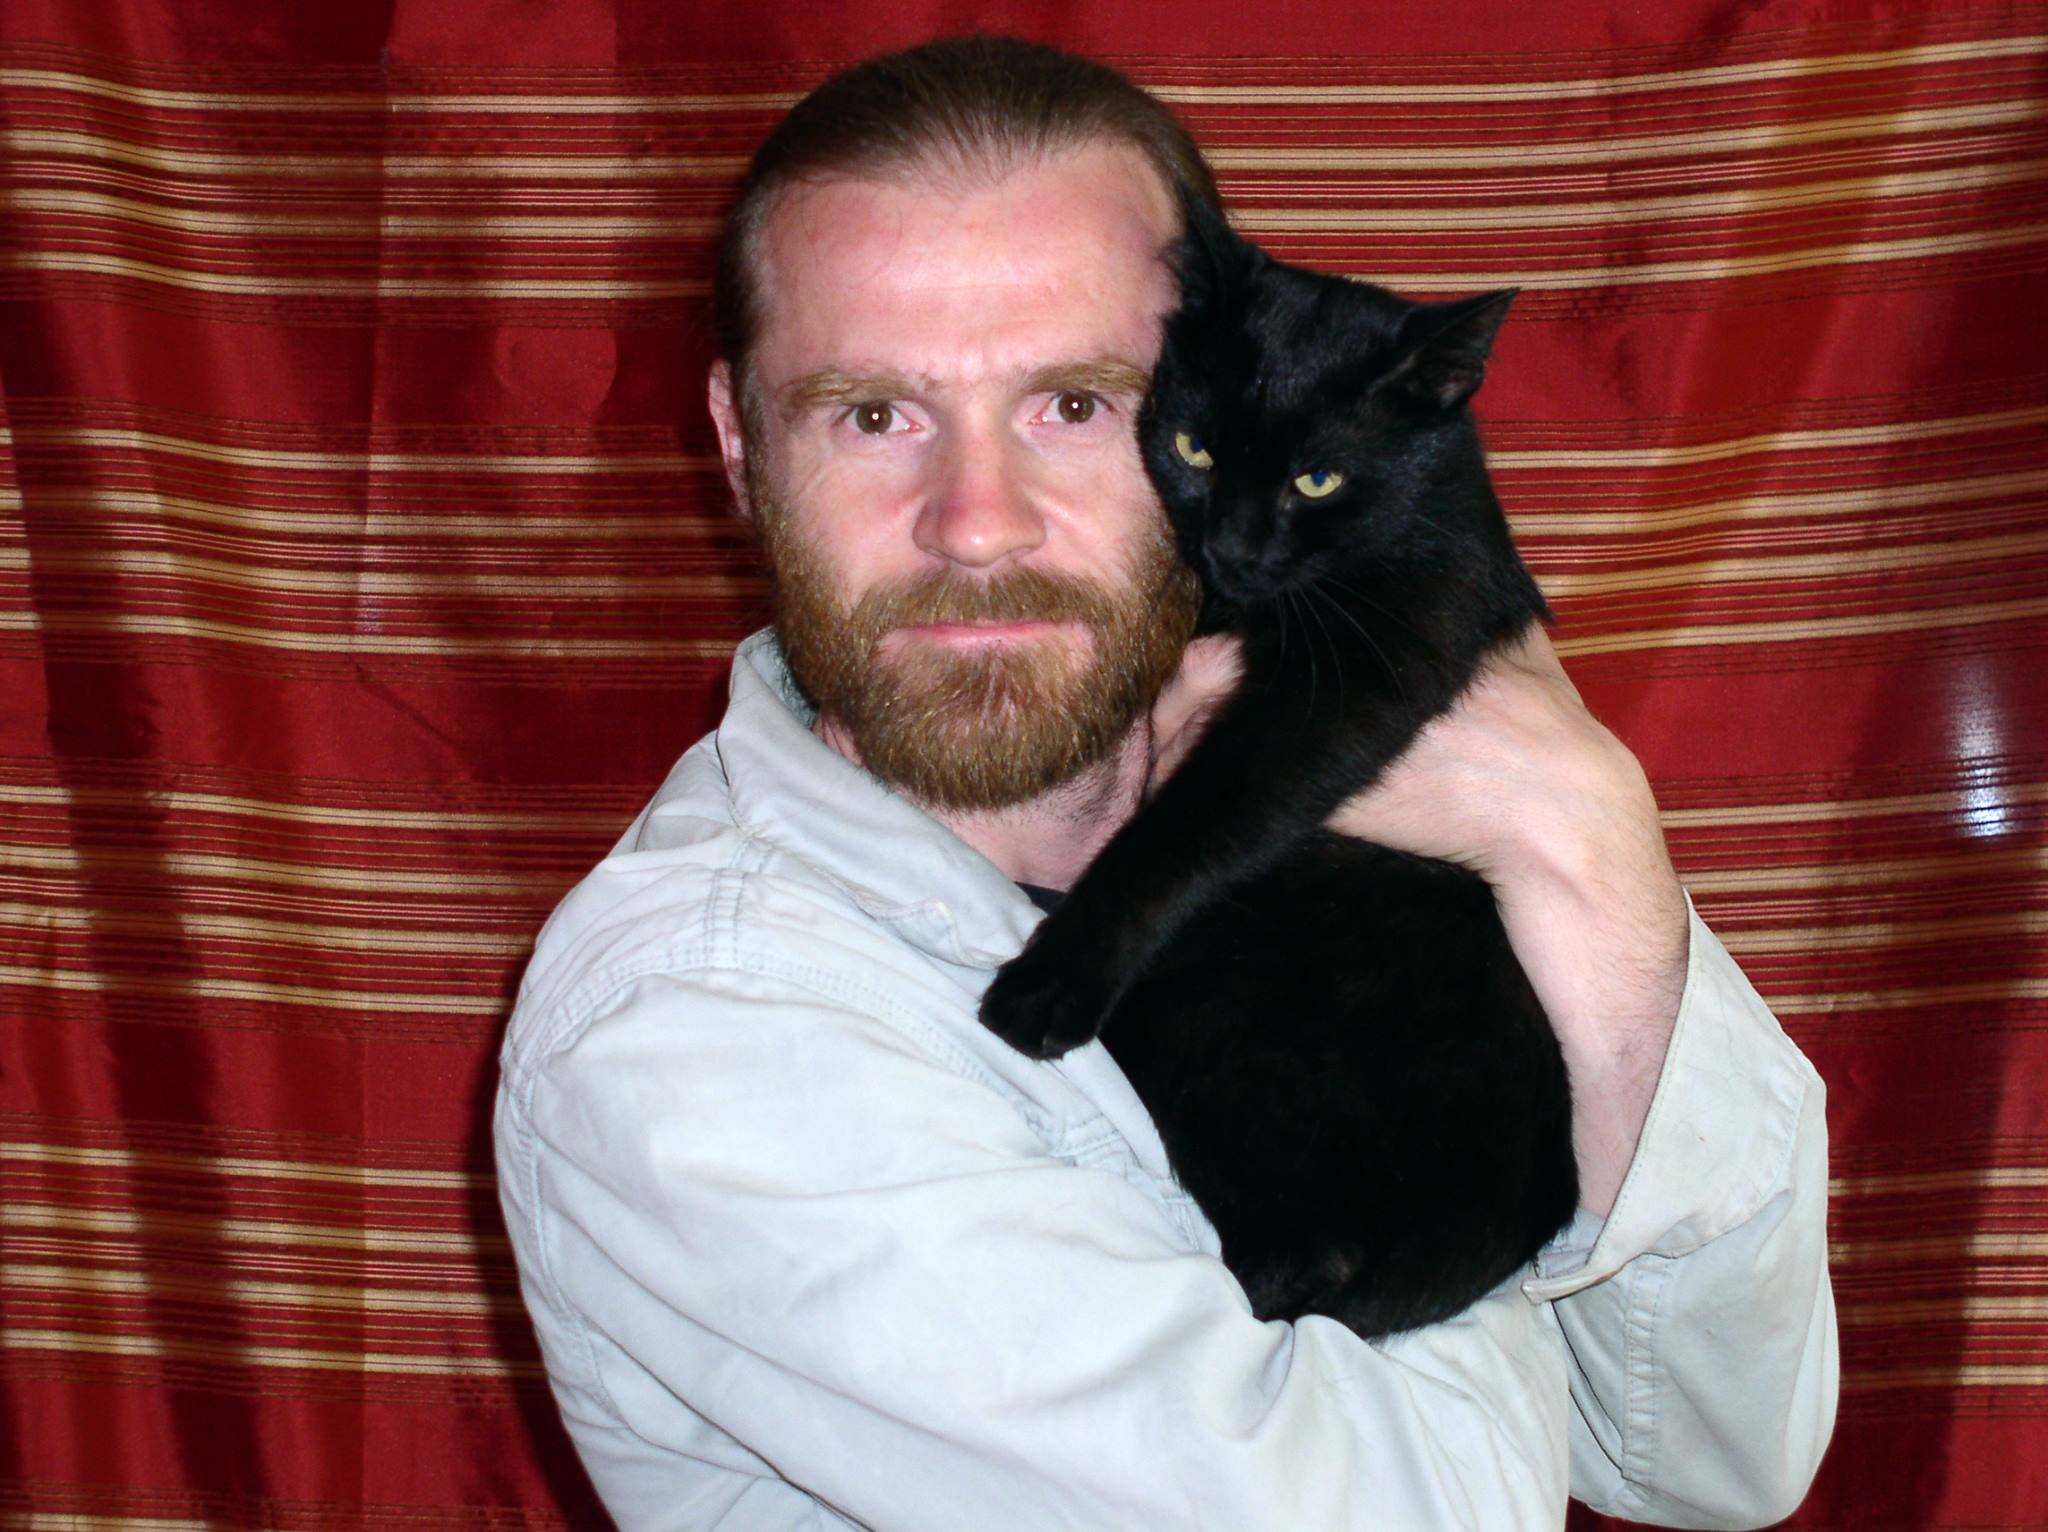 Котов кастрируют, а вот кошек – стерилизуют? Разберемся с терминами